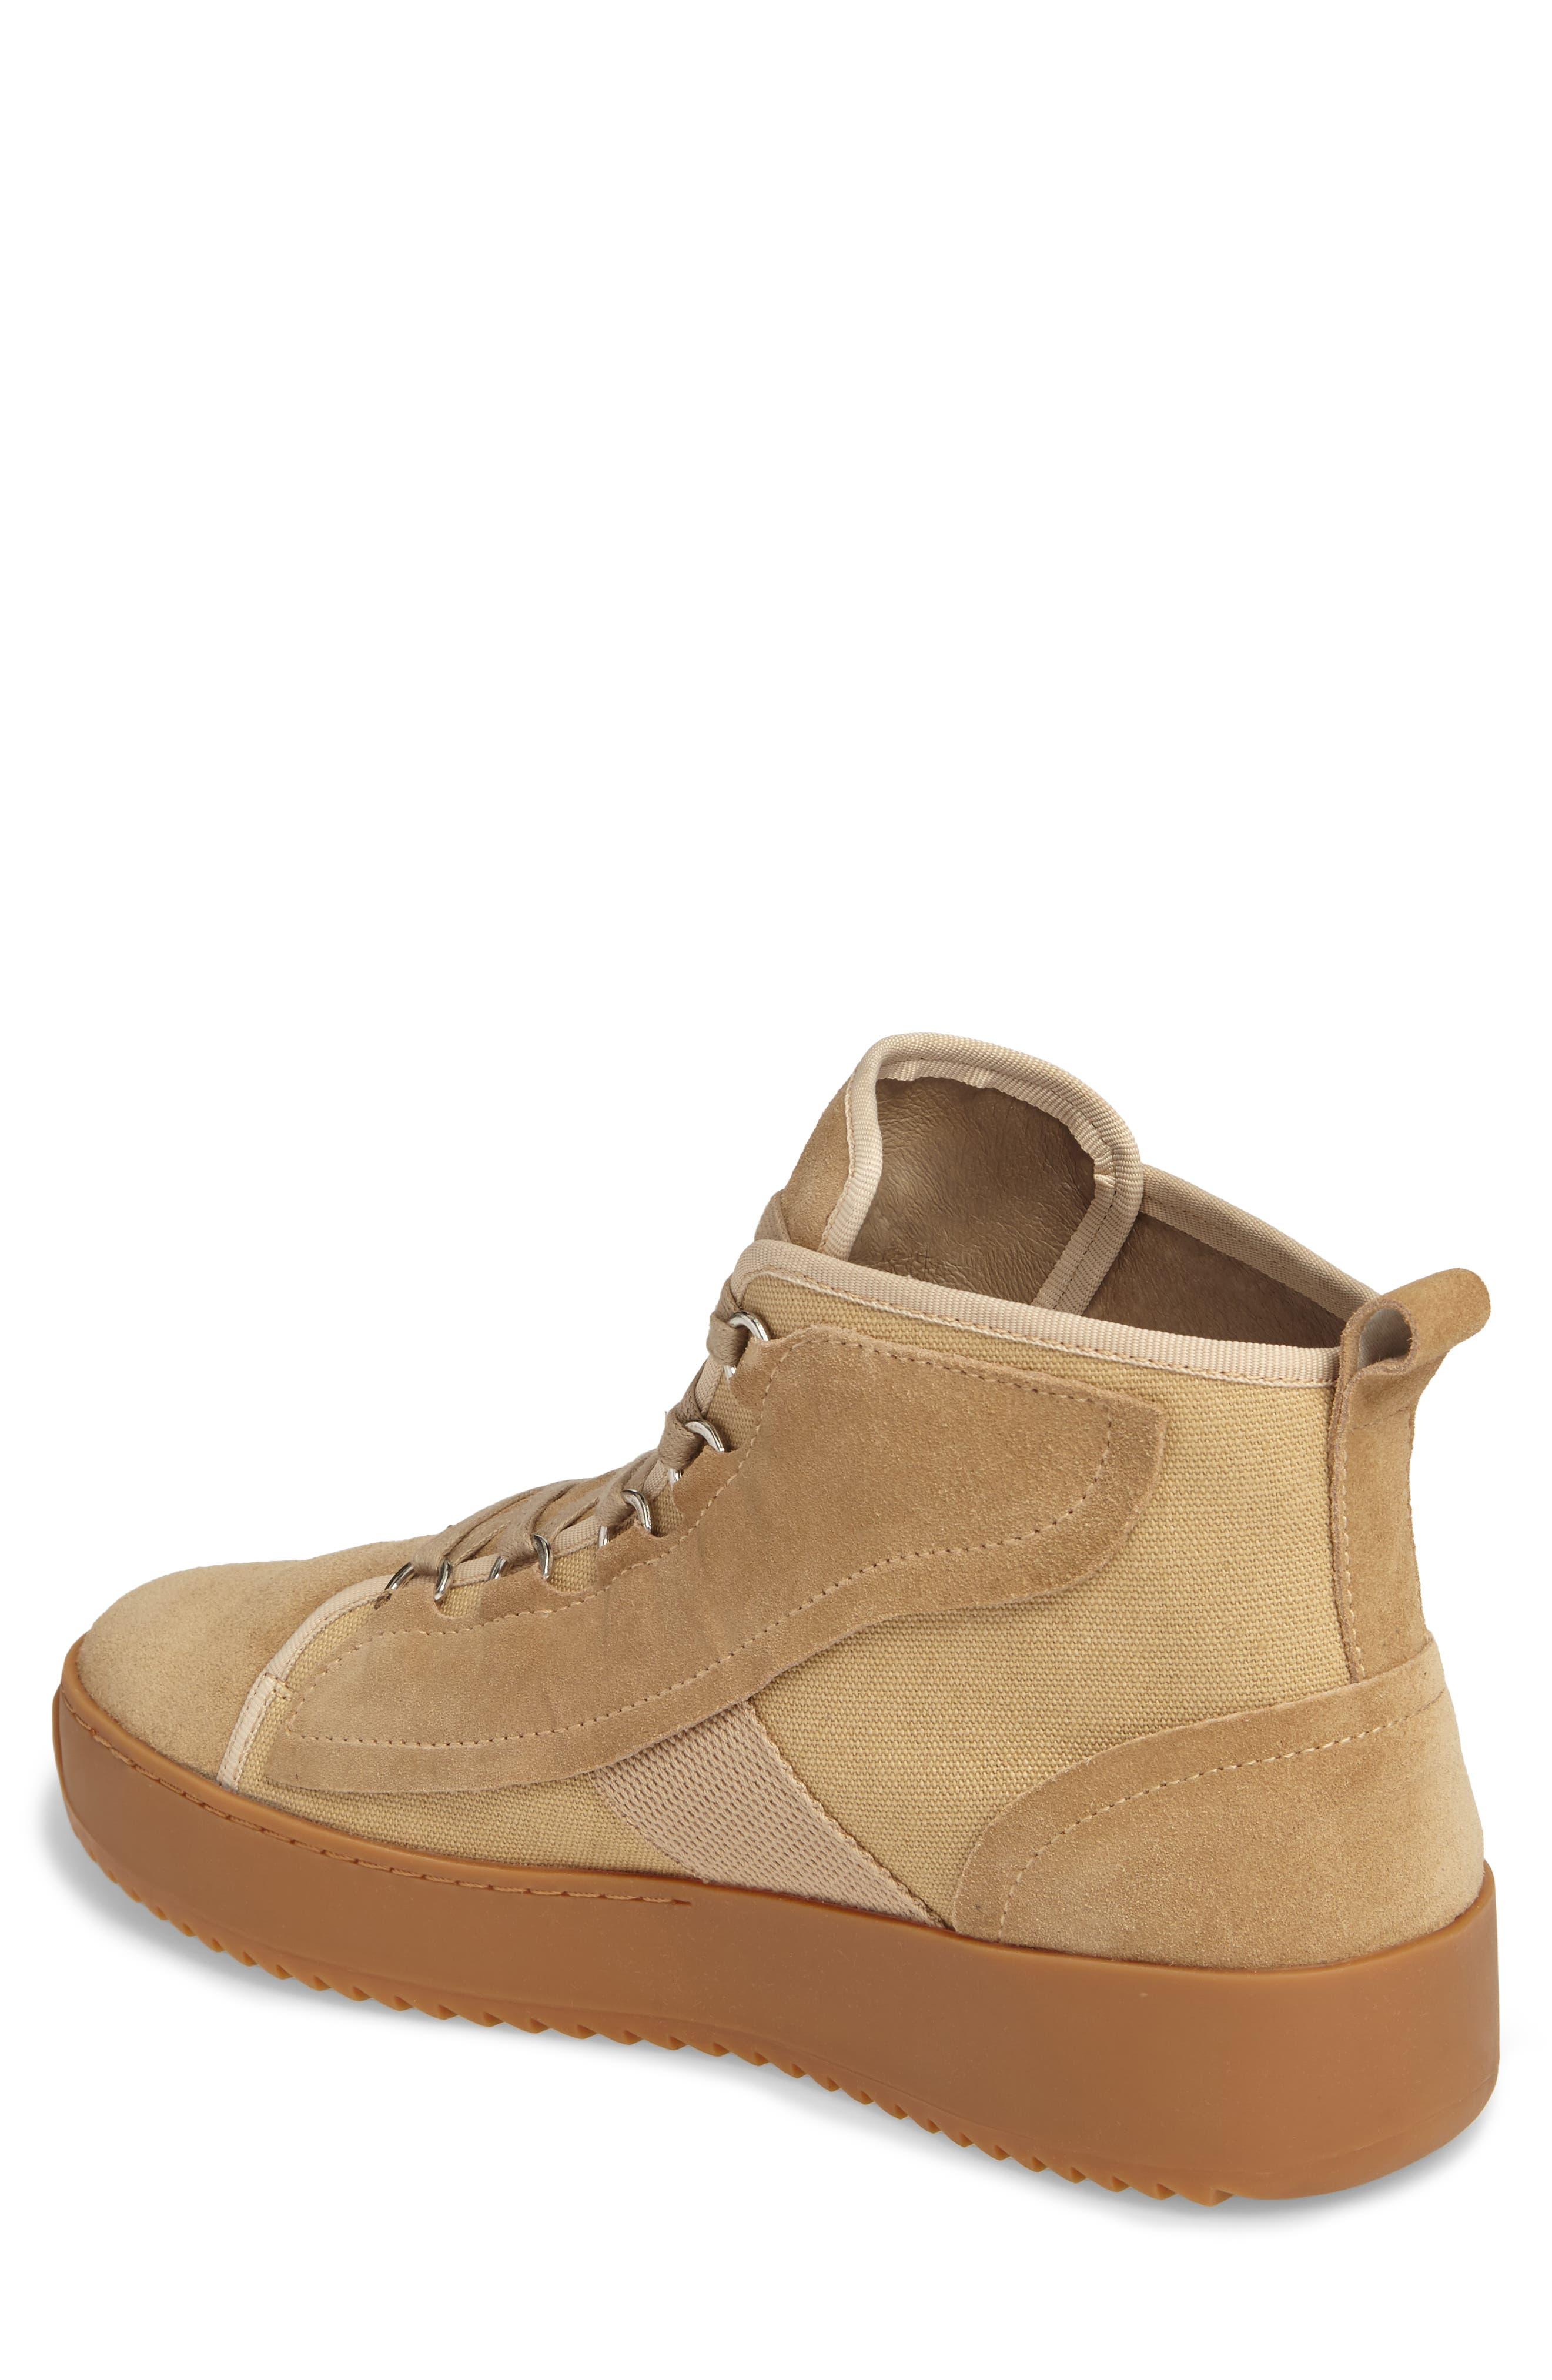 Sander Sneaker,                             Alternate thumbnail 2, color,                             Sand Suede